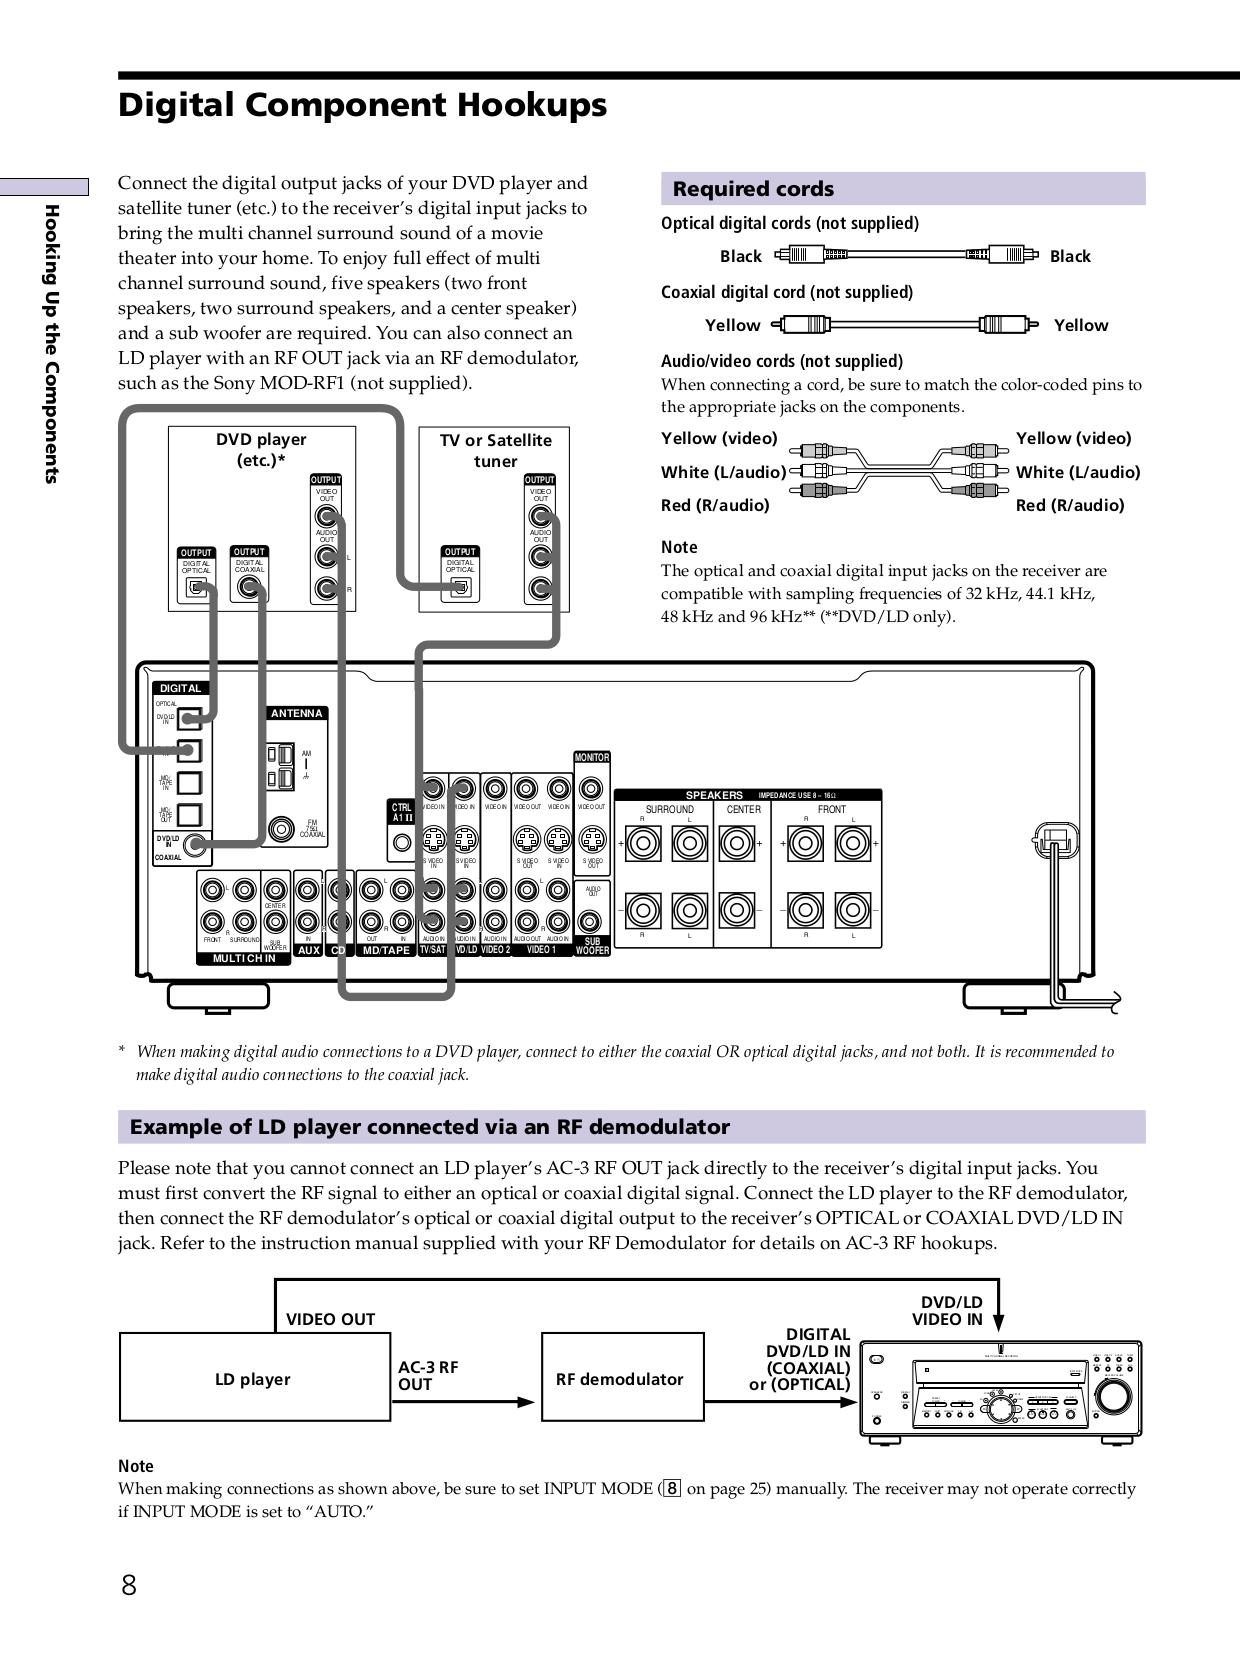 pdf manual for sony receiver str de675 rh umlib com Sony STR De675 Problems Dolby Digital DTS Sony 32 Bites